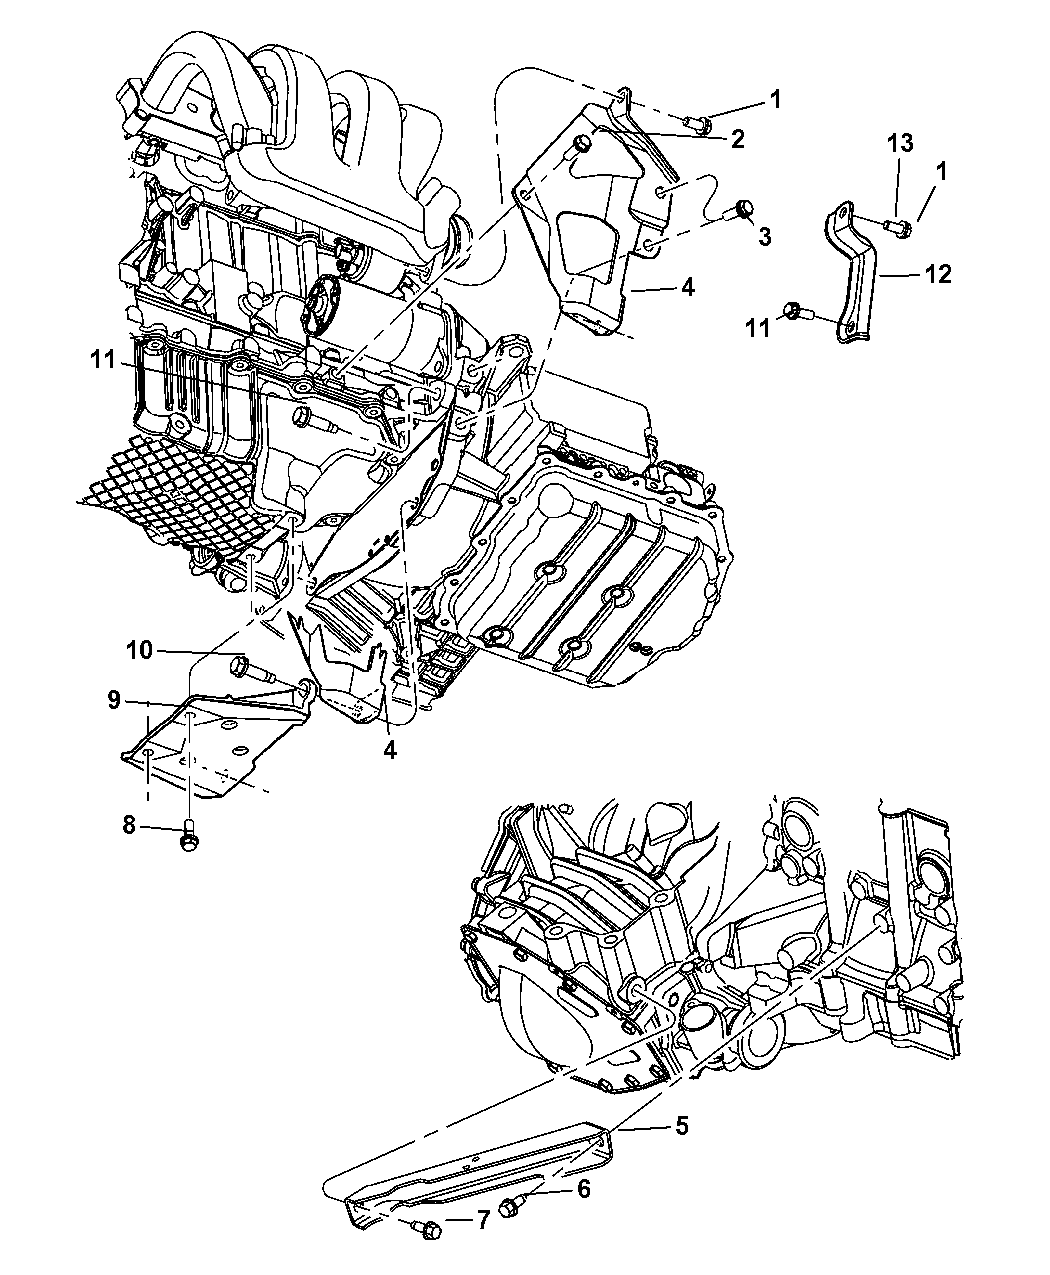 2003 Dodge Neon Engine Diagram